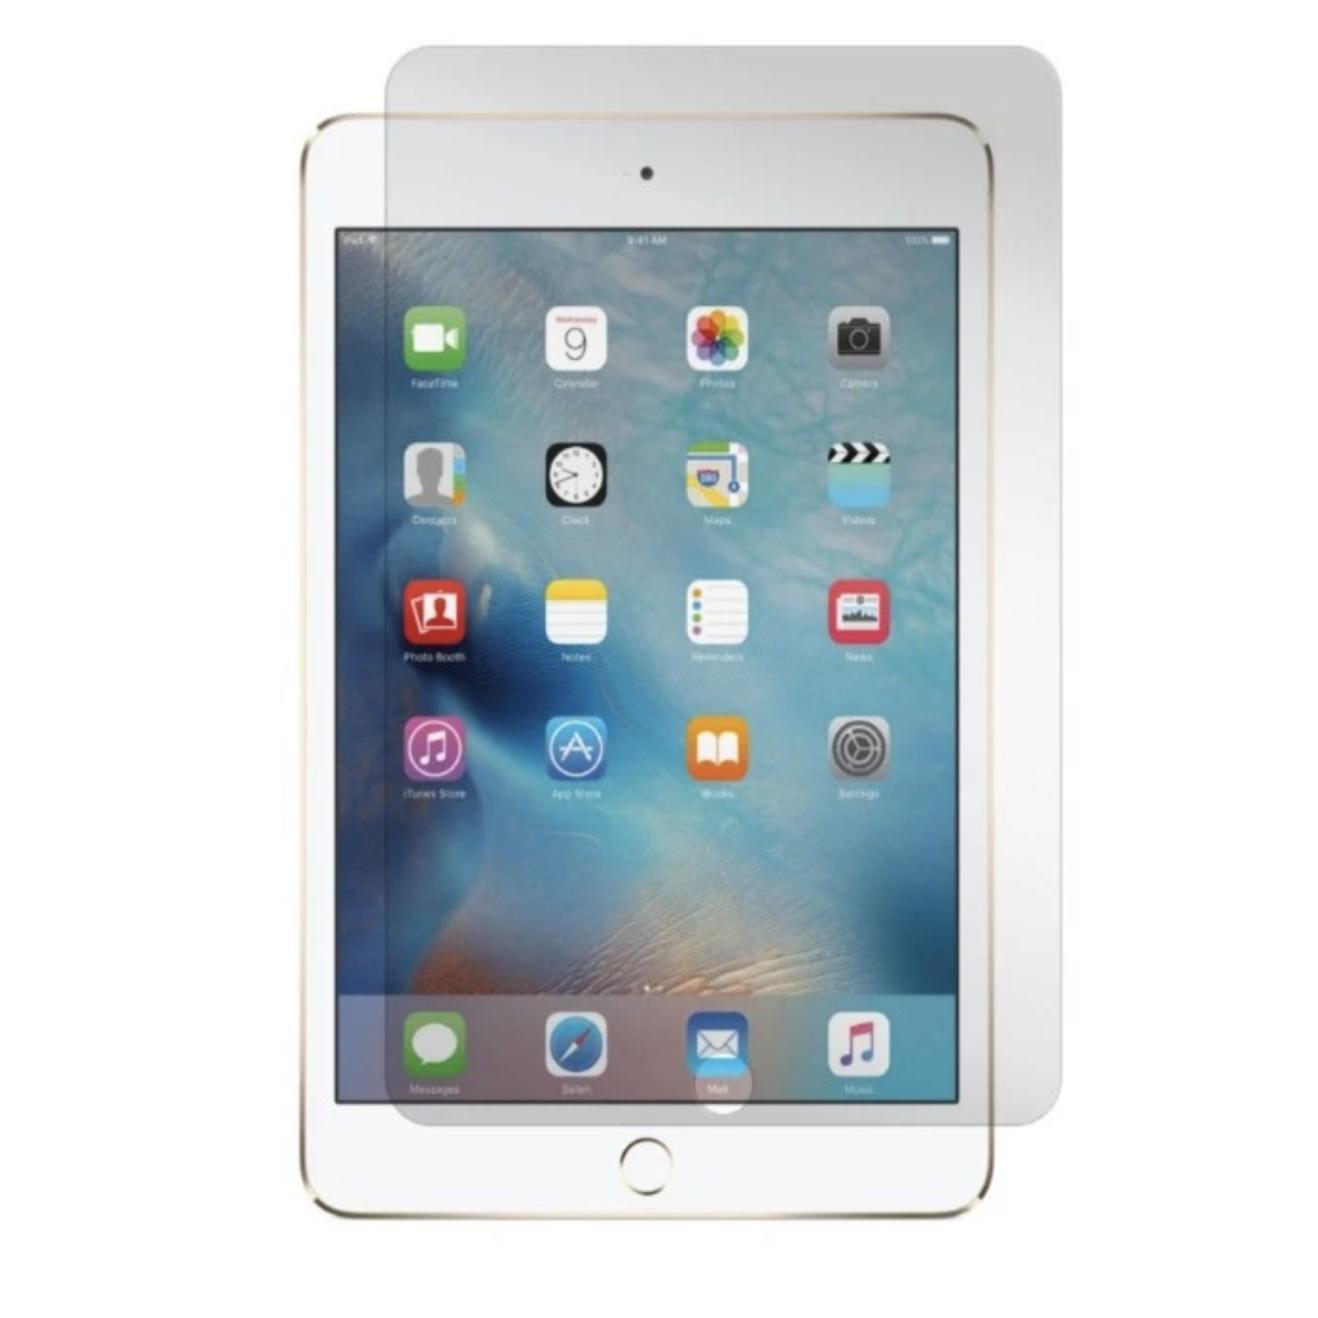 Gadget Guard - Black Ice Edition for iPad - iPad mini 4